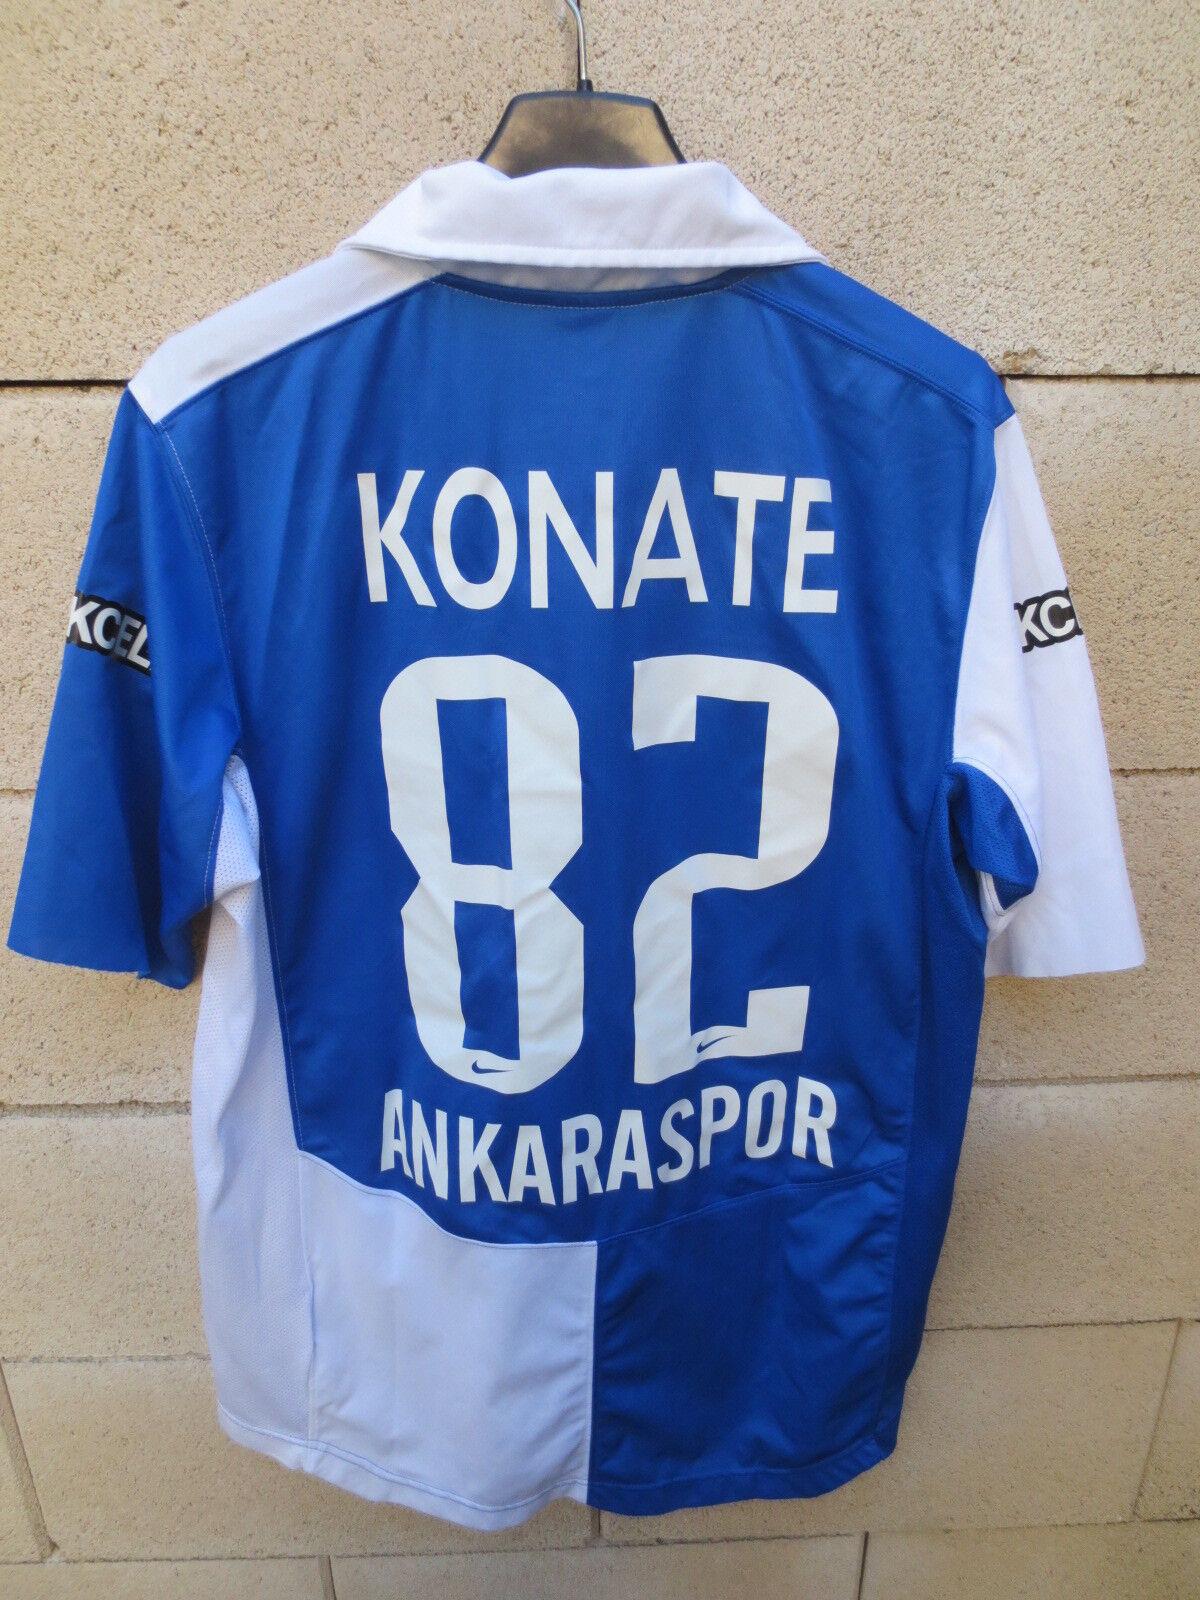 Maillot ANKARASPOR porté KONATE n°82 Turquie Turkey NIKE match worn shirt rare